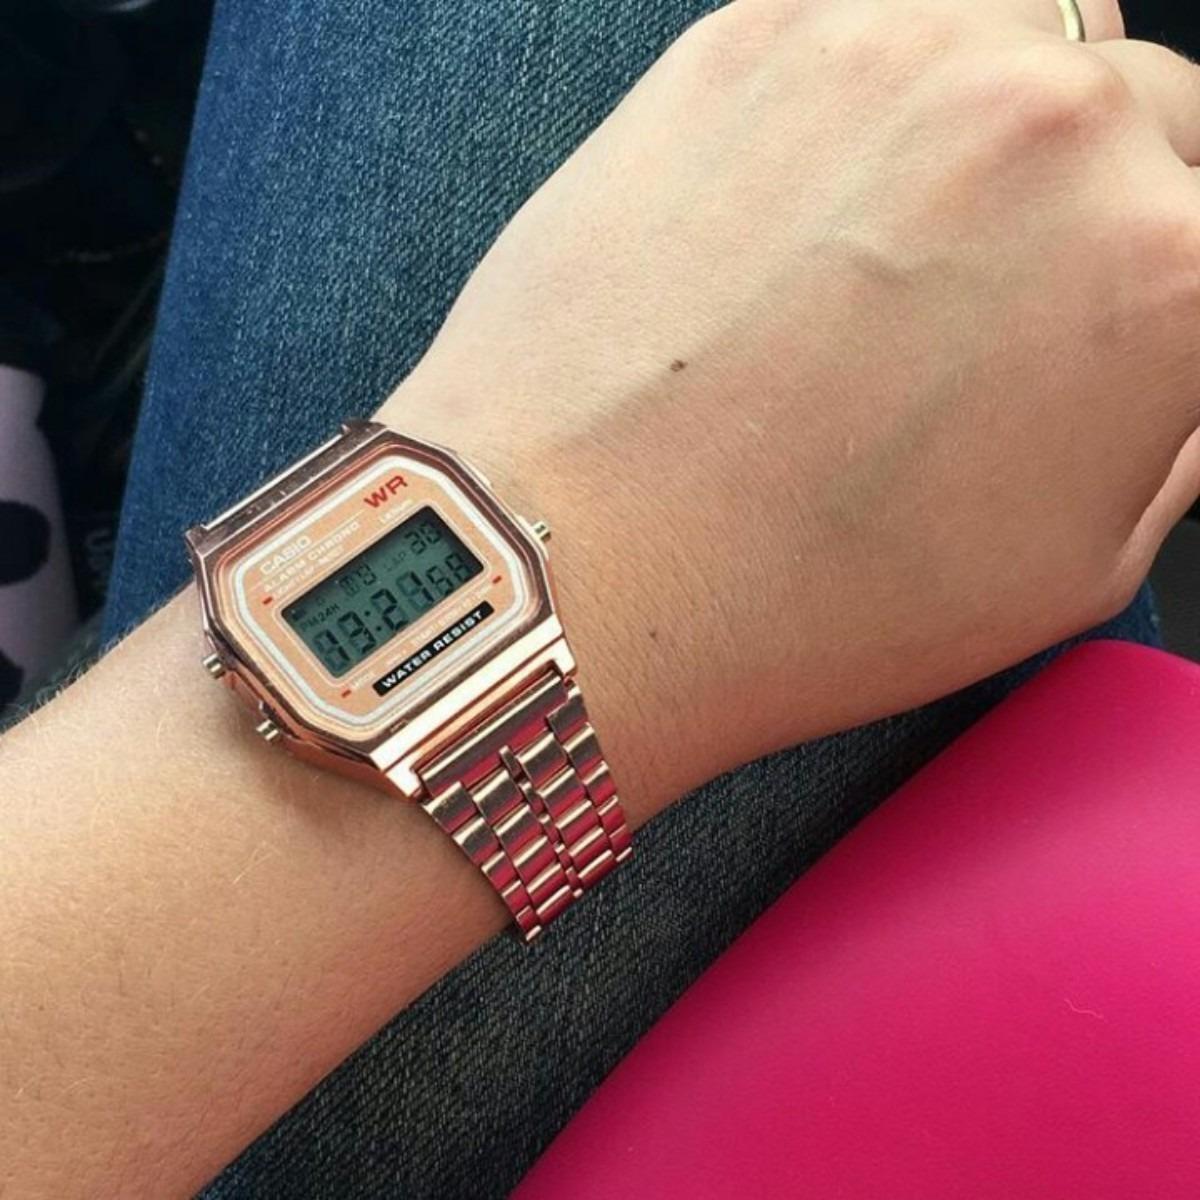 ab8b8f3f806 Relógio Casio Vintage Digital Unissex Feminino Masculino